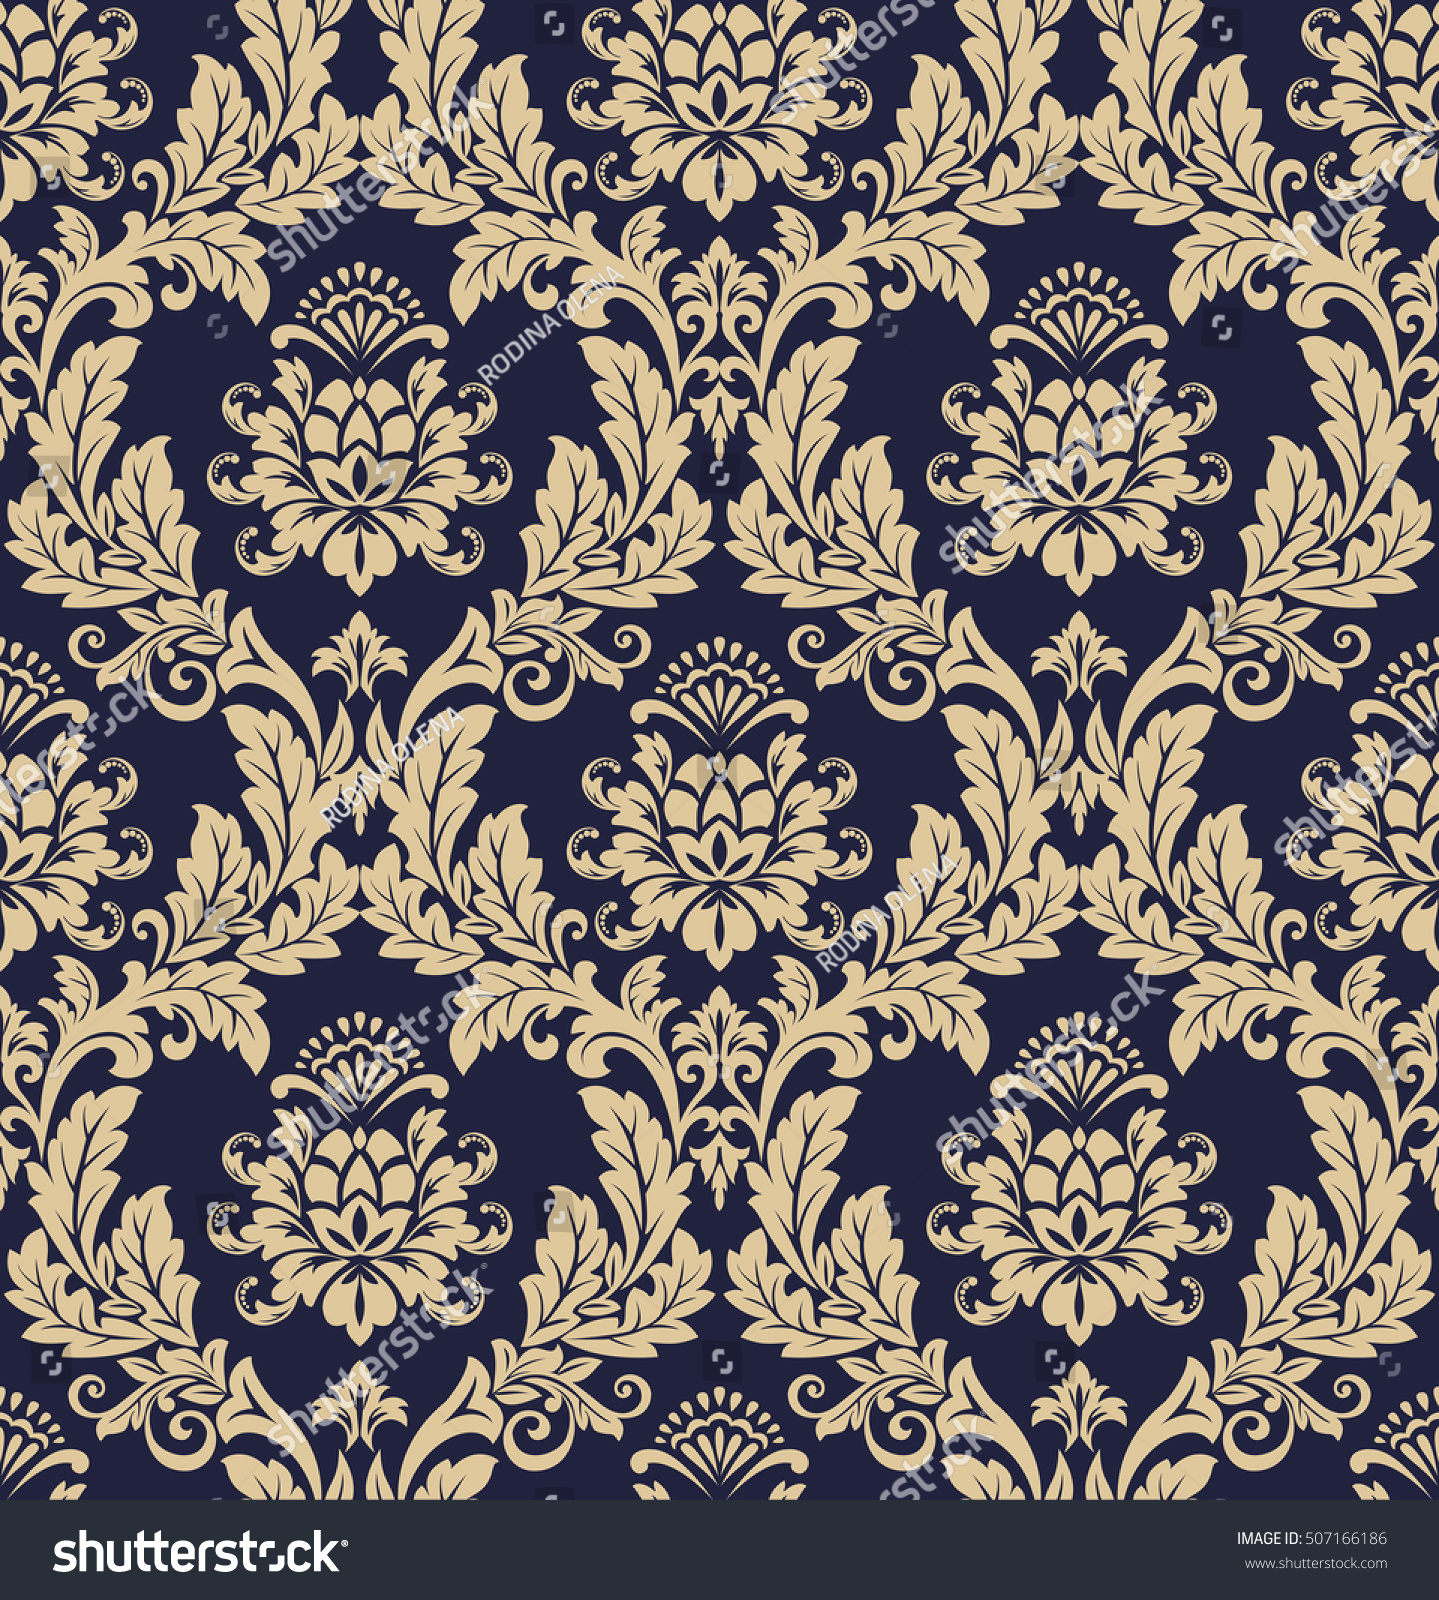 Floral Pattern Wallpaper Baroque Damask Seamless Stock Image